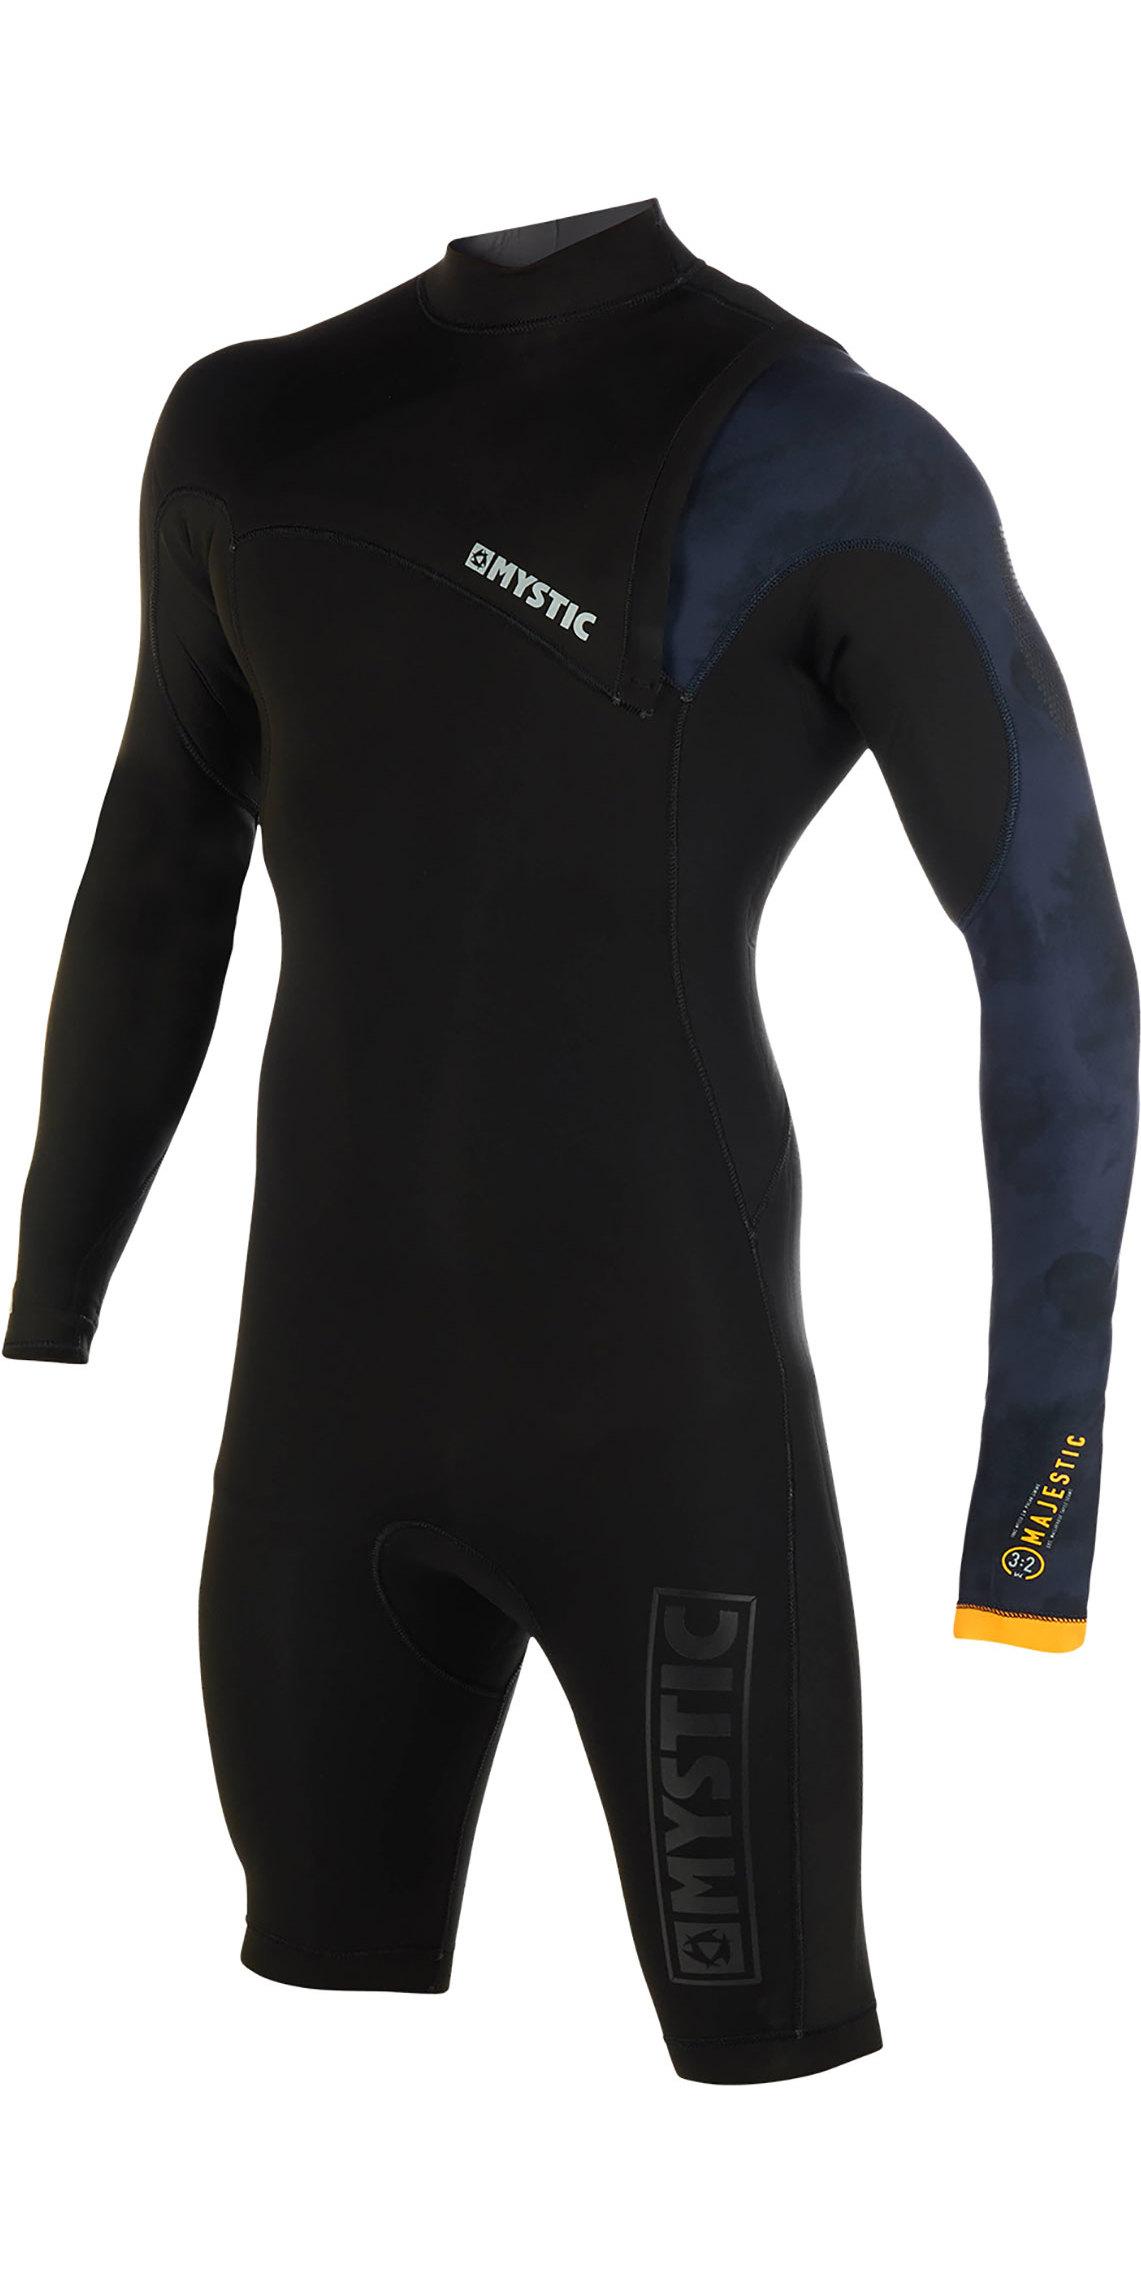 Palm Kayak or Kayaking Womens Quantum 3MM Neoprene Wetsuit Front Zip Long John Black Easy Stretch